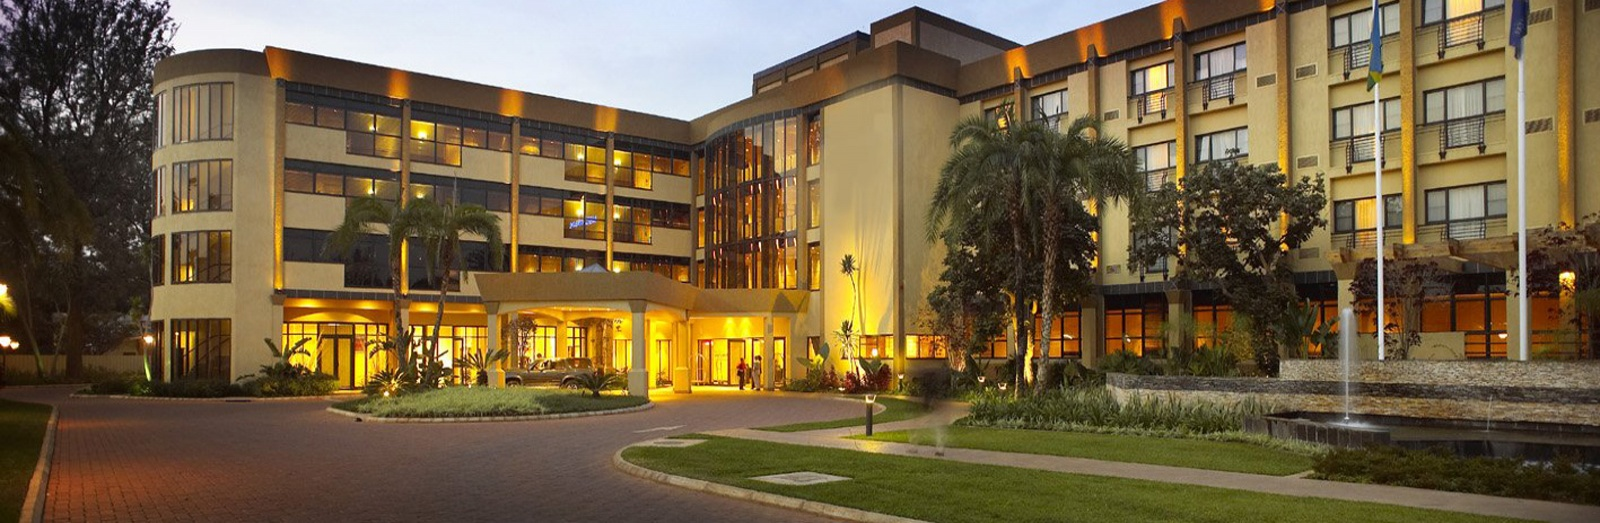 Kigali-serena-hotel-Rwanda-exterior